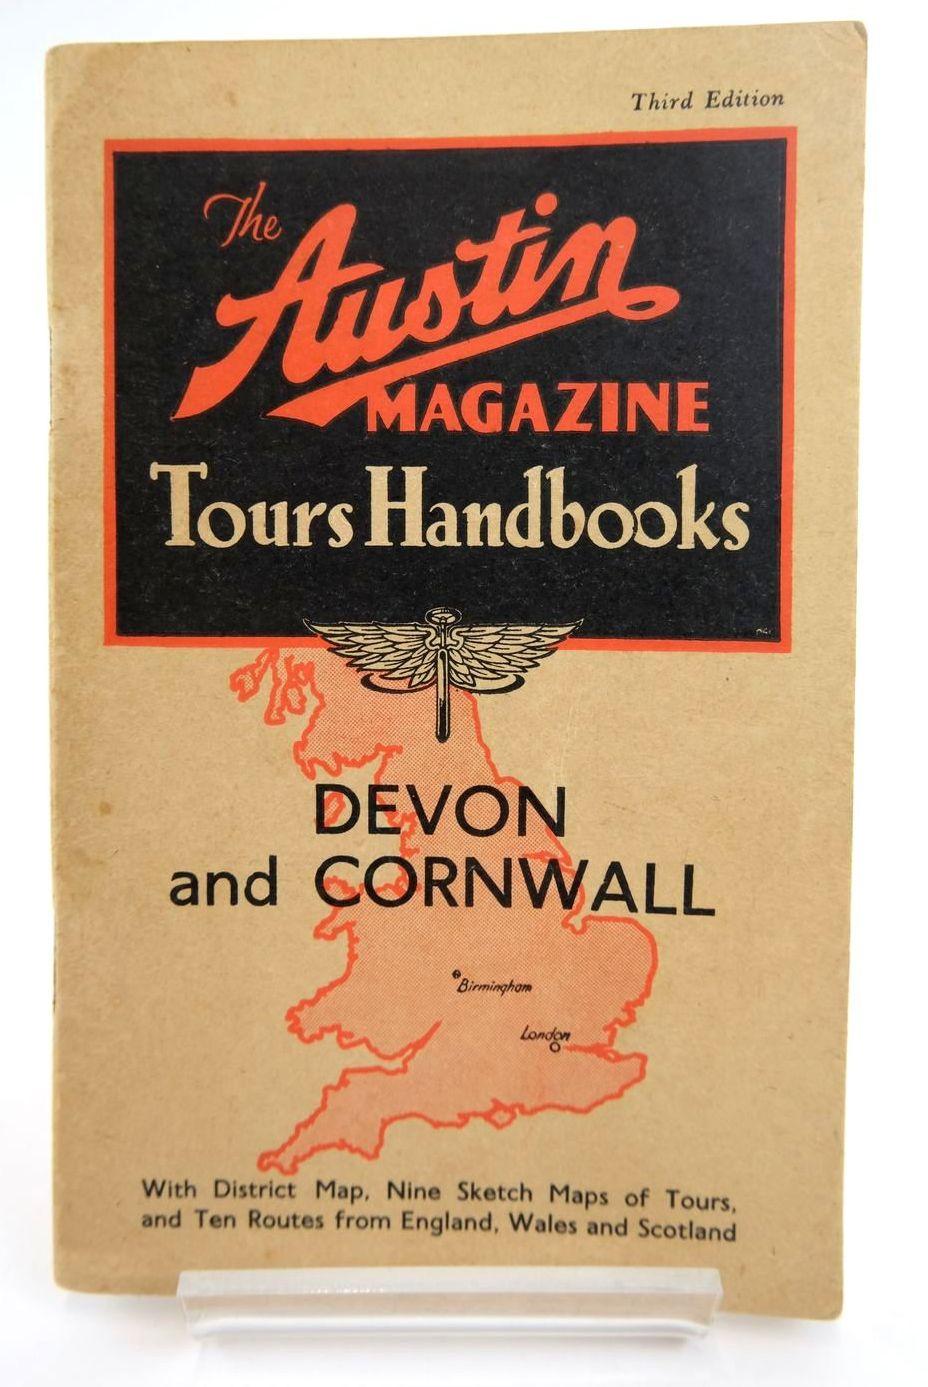 Photo of THE AUSTIN MAGAZINE TOURS HANDBOOKS DEVON AND CORNWALL- Stock Number: 2133439